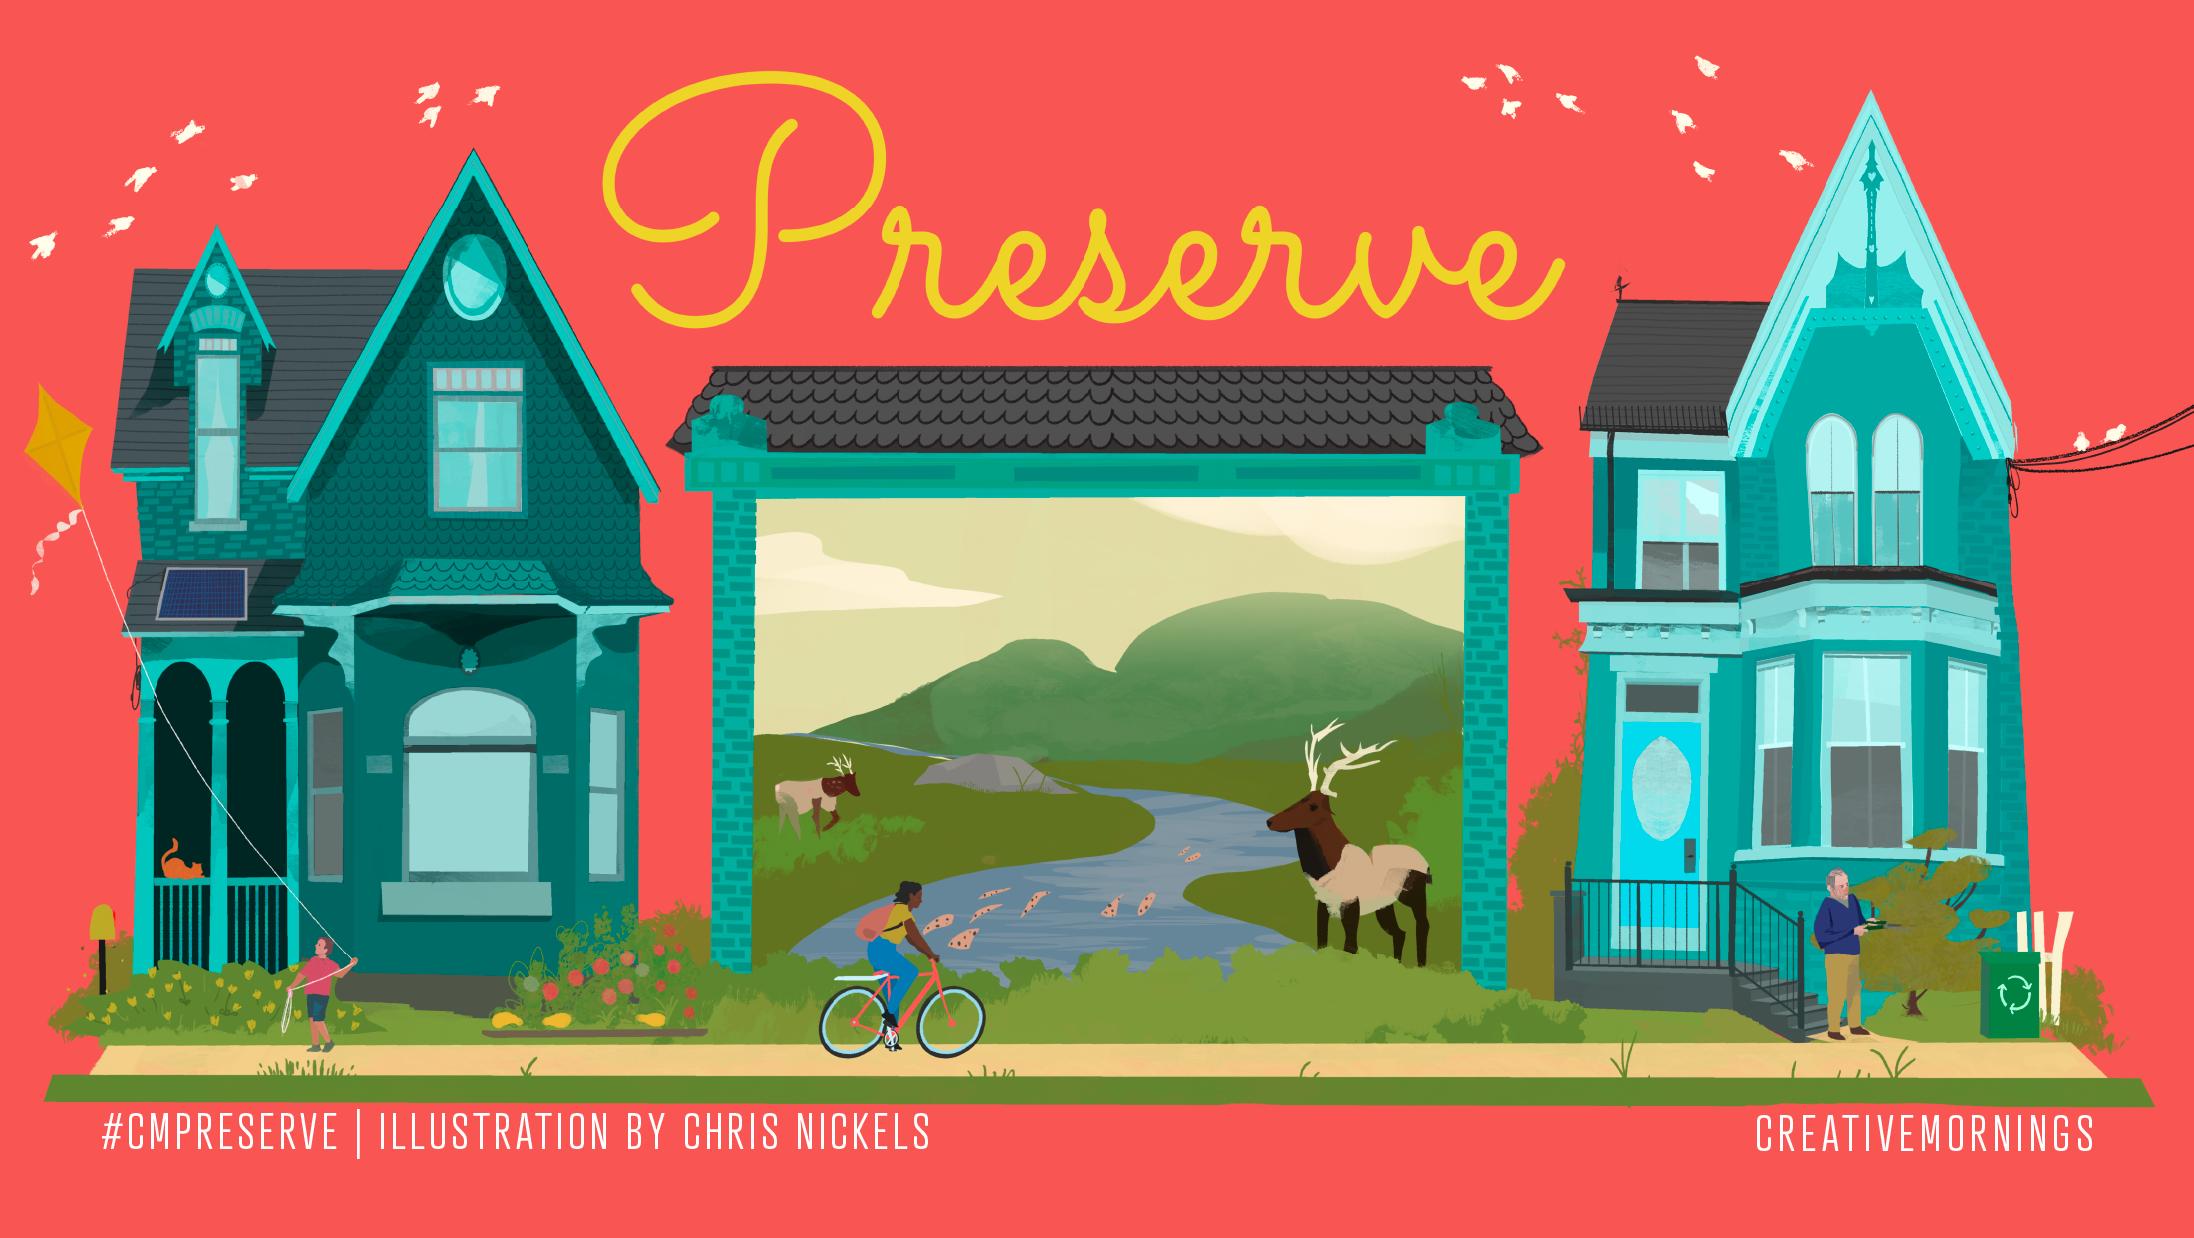 Preserve_Illustration_Layout_creativemornings.com_themepage